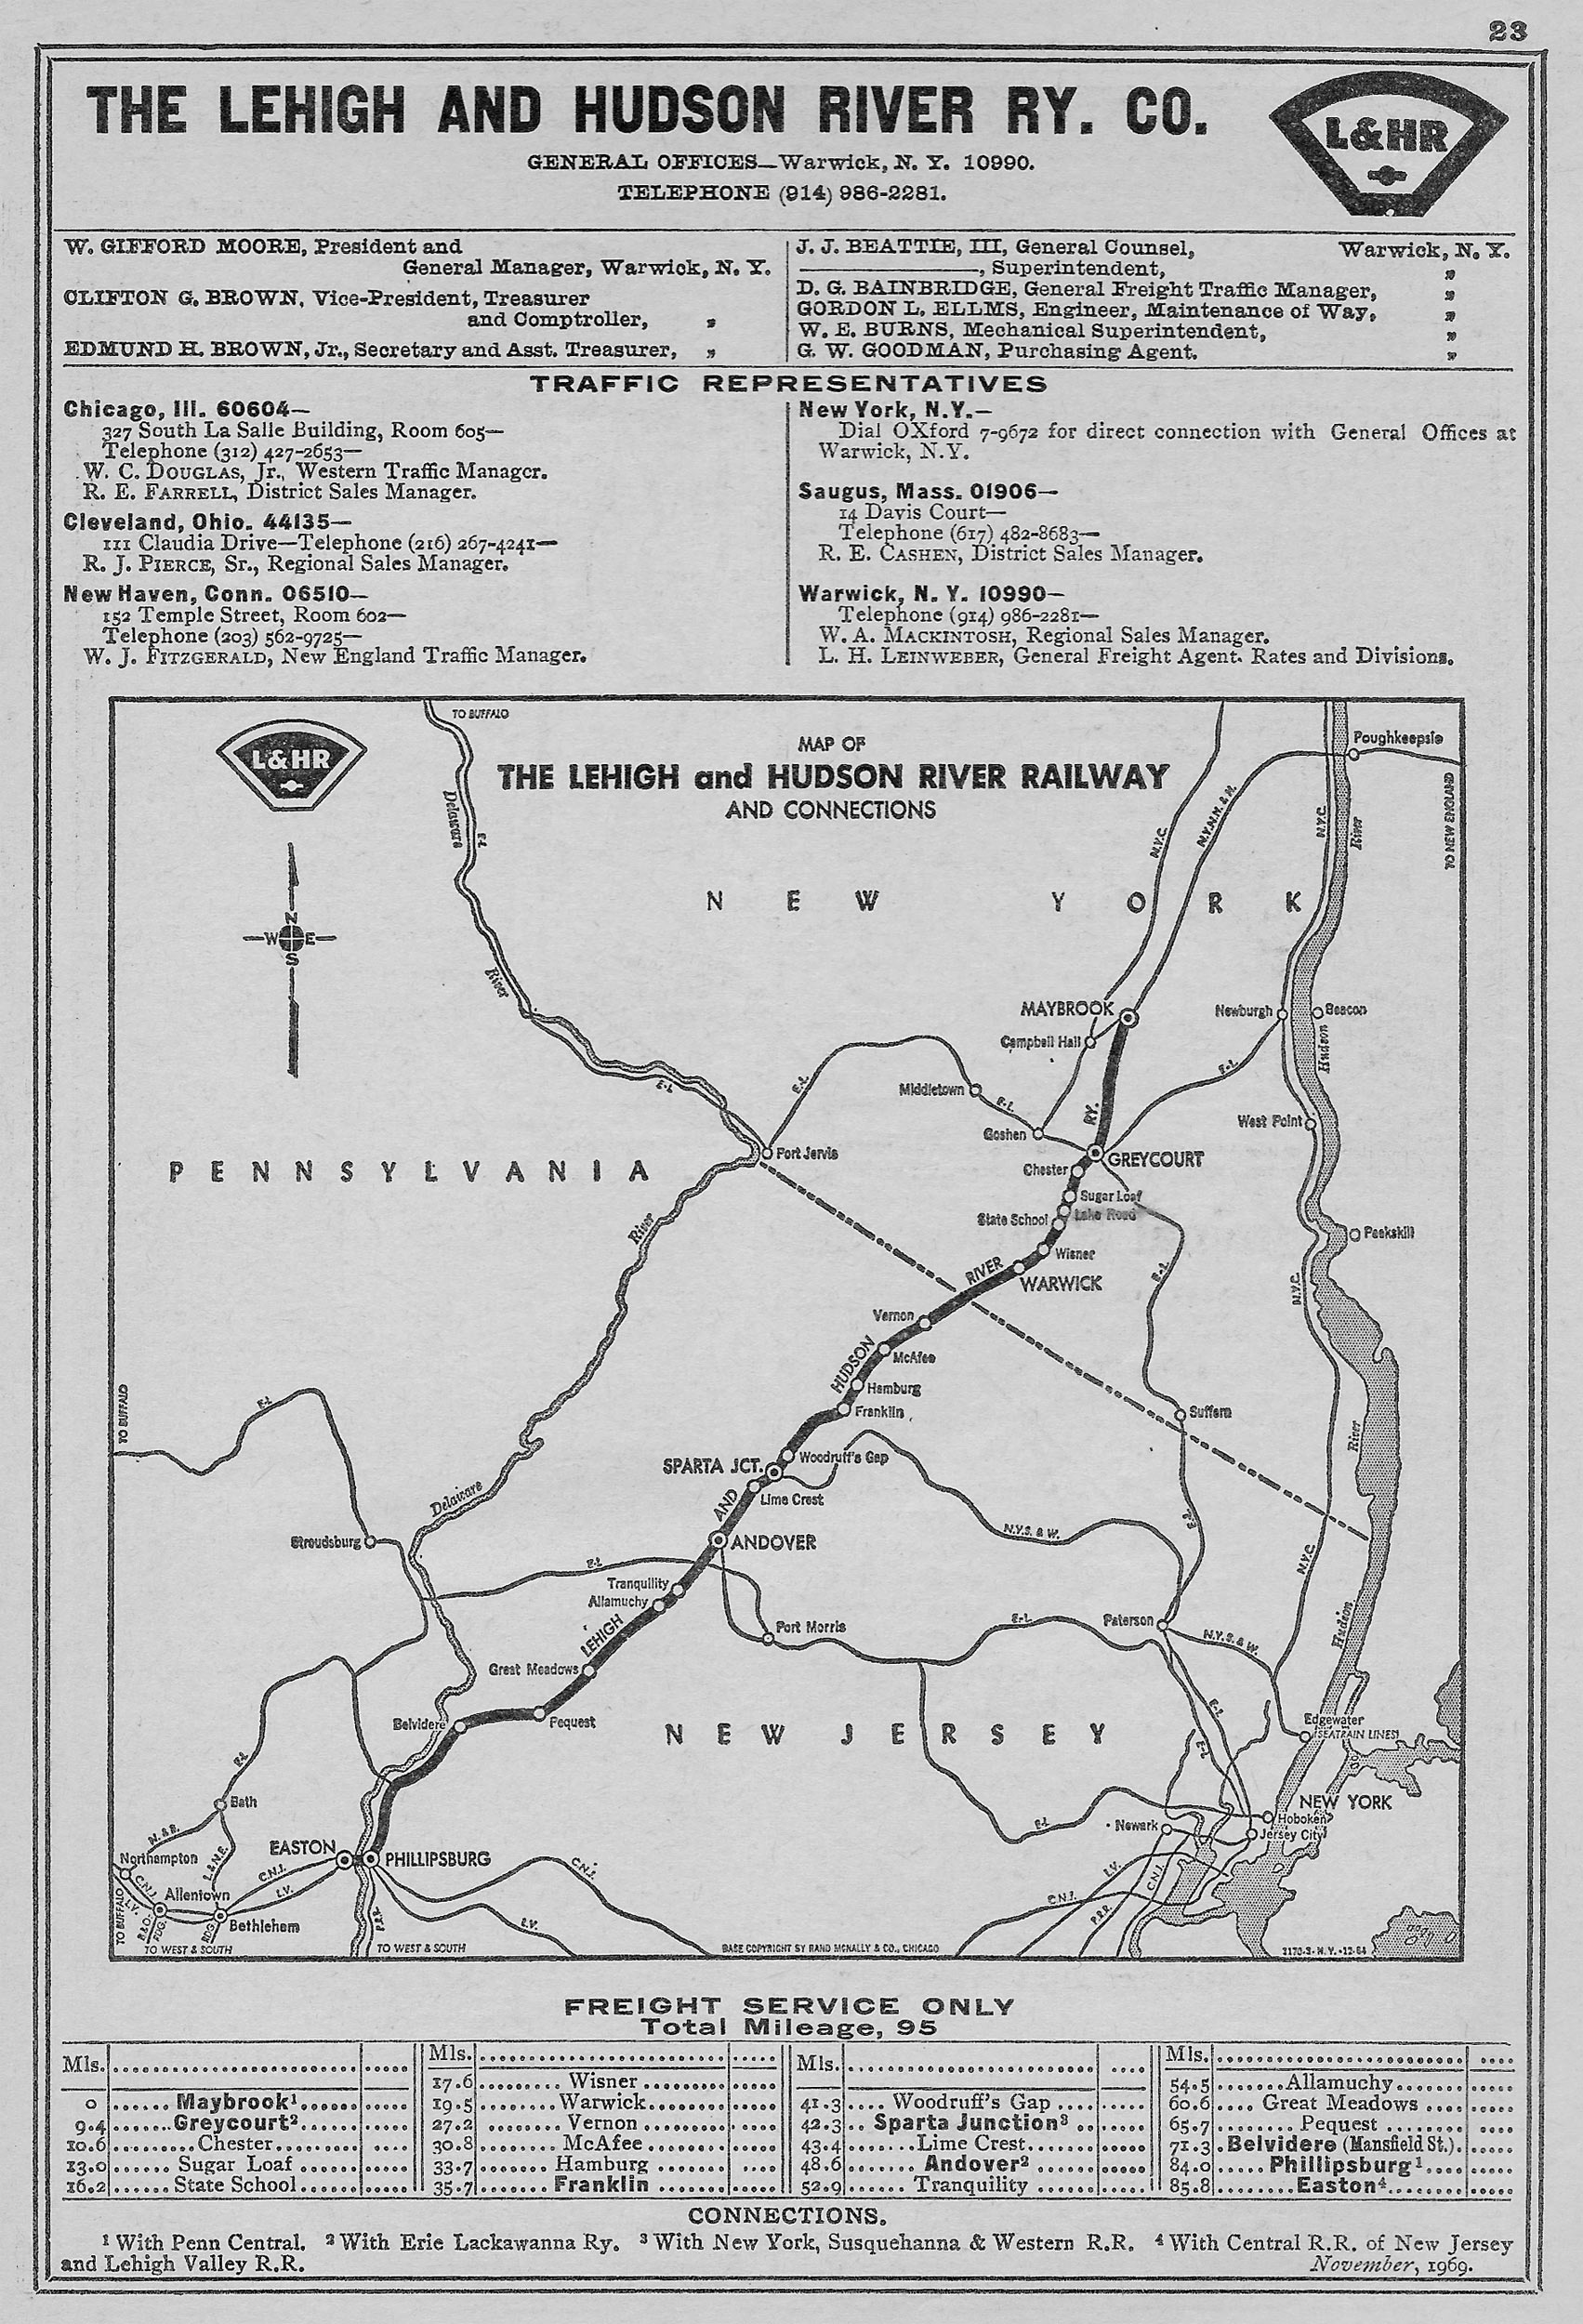 Lehigh and Hudson River Railway